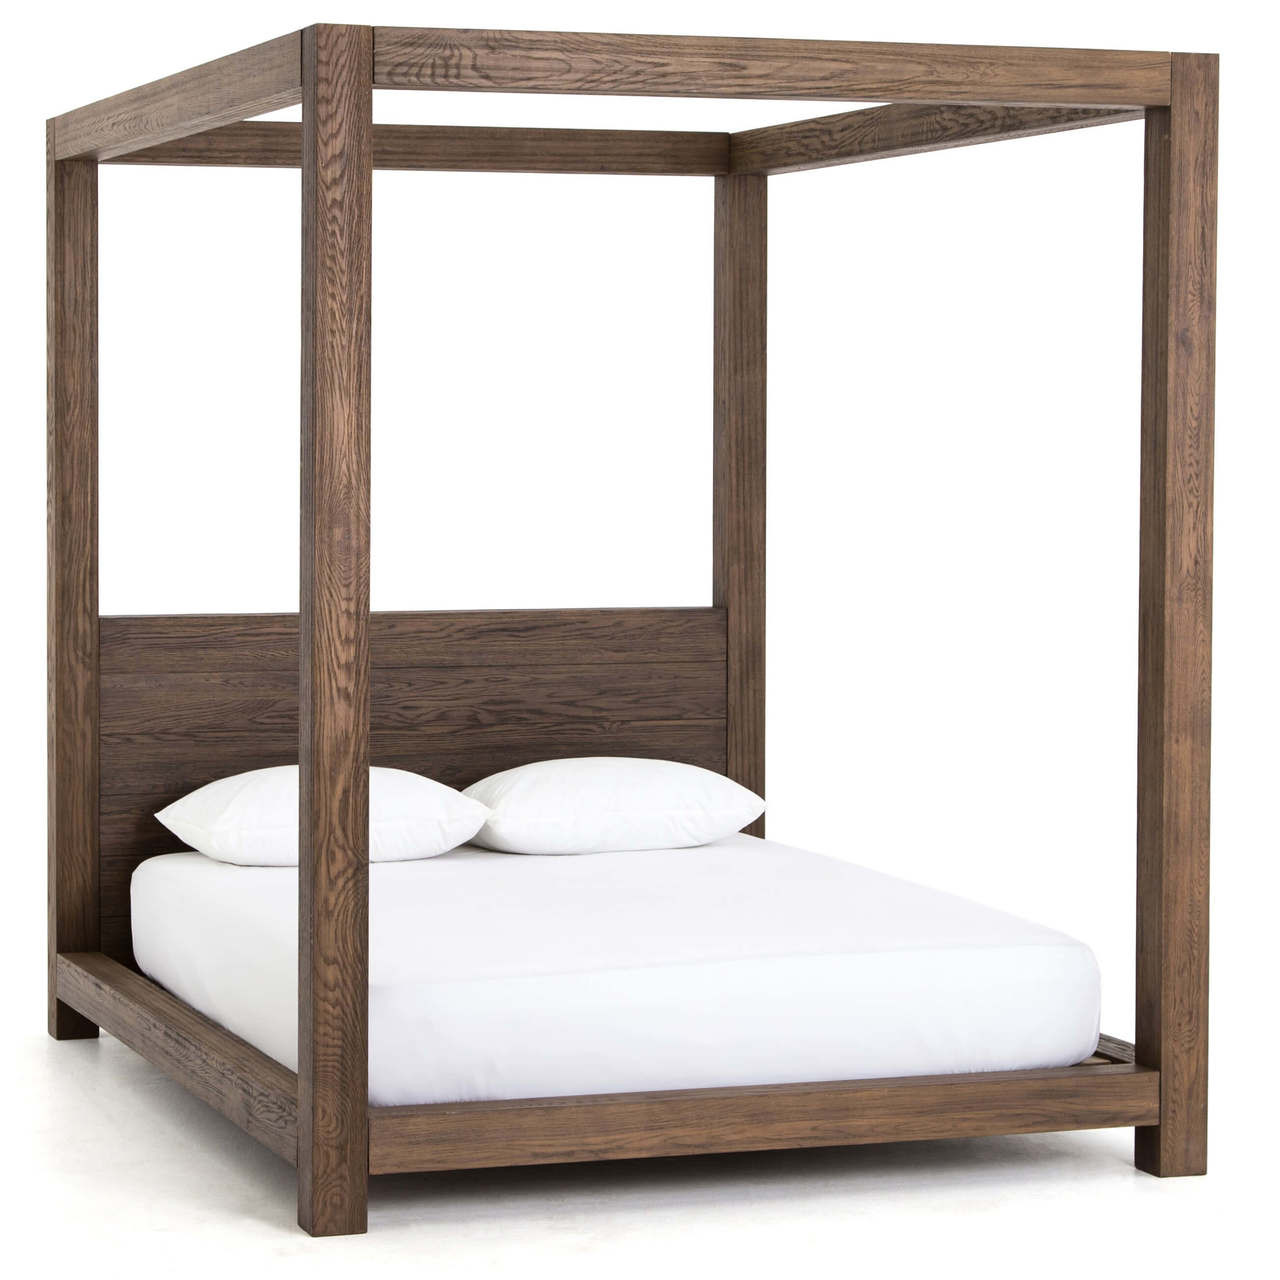 Cheap Modern Bed Frames: Williams Wood King Platform Canopy Bed Frame - Grey